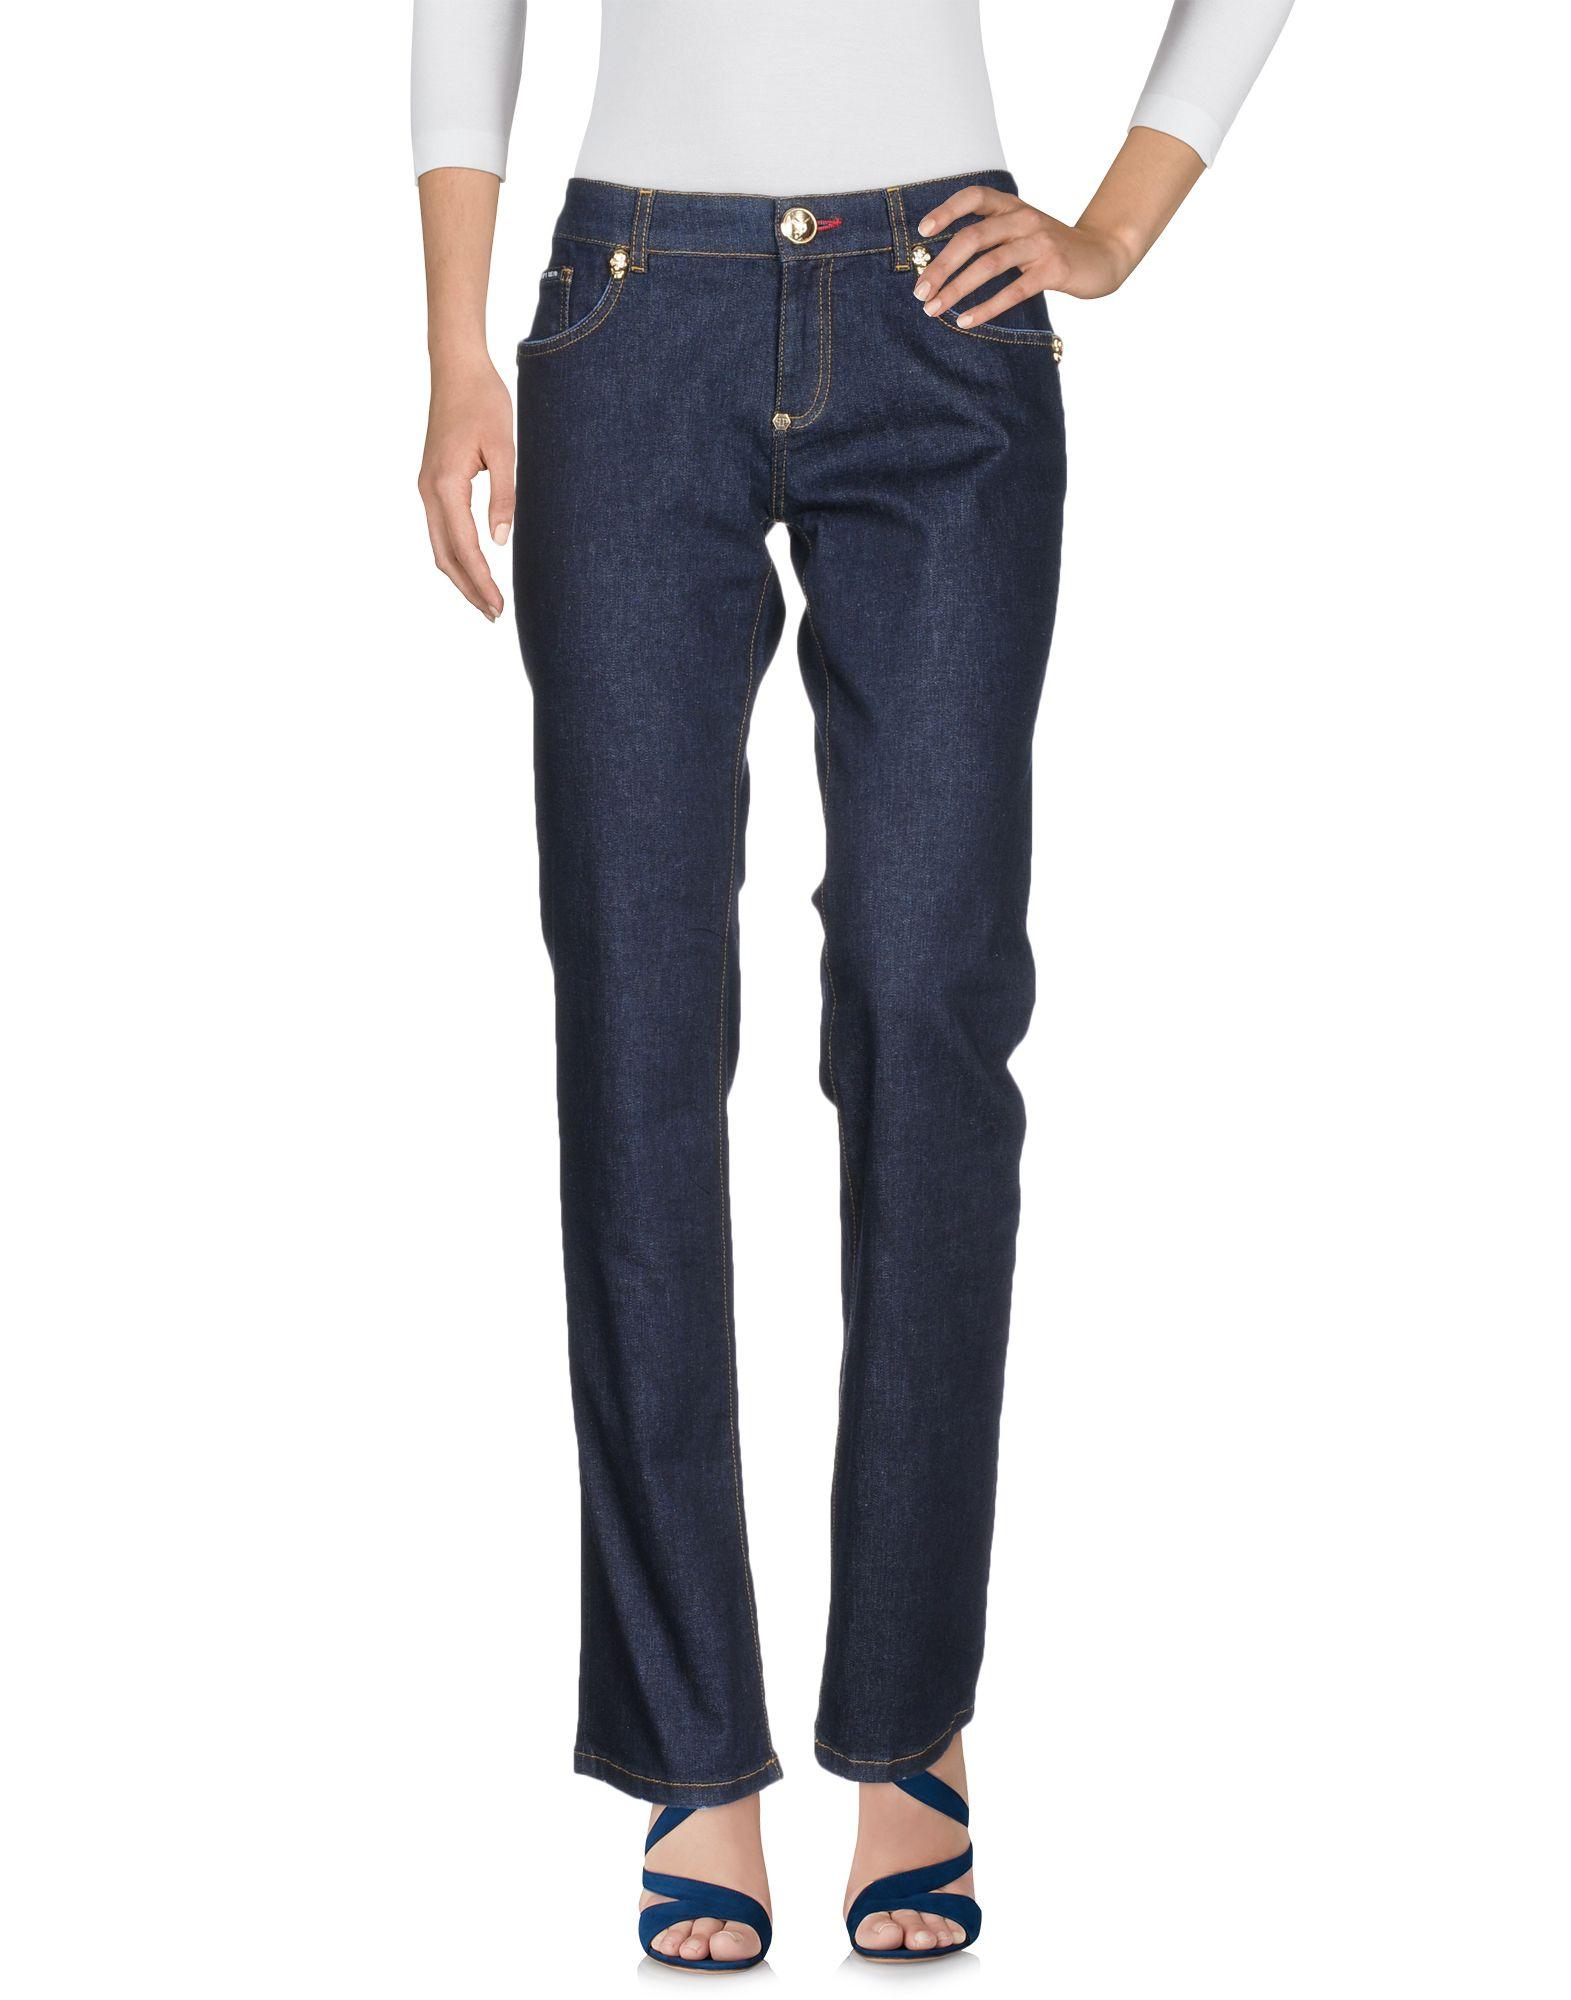 Pantaloni Jeans Philipp Plein Donna - Acquista online su Bjbjcbx0B